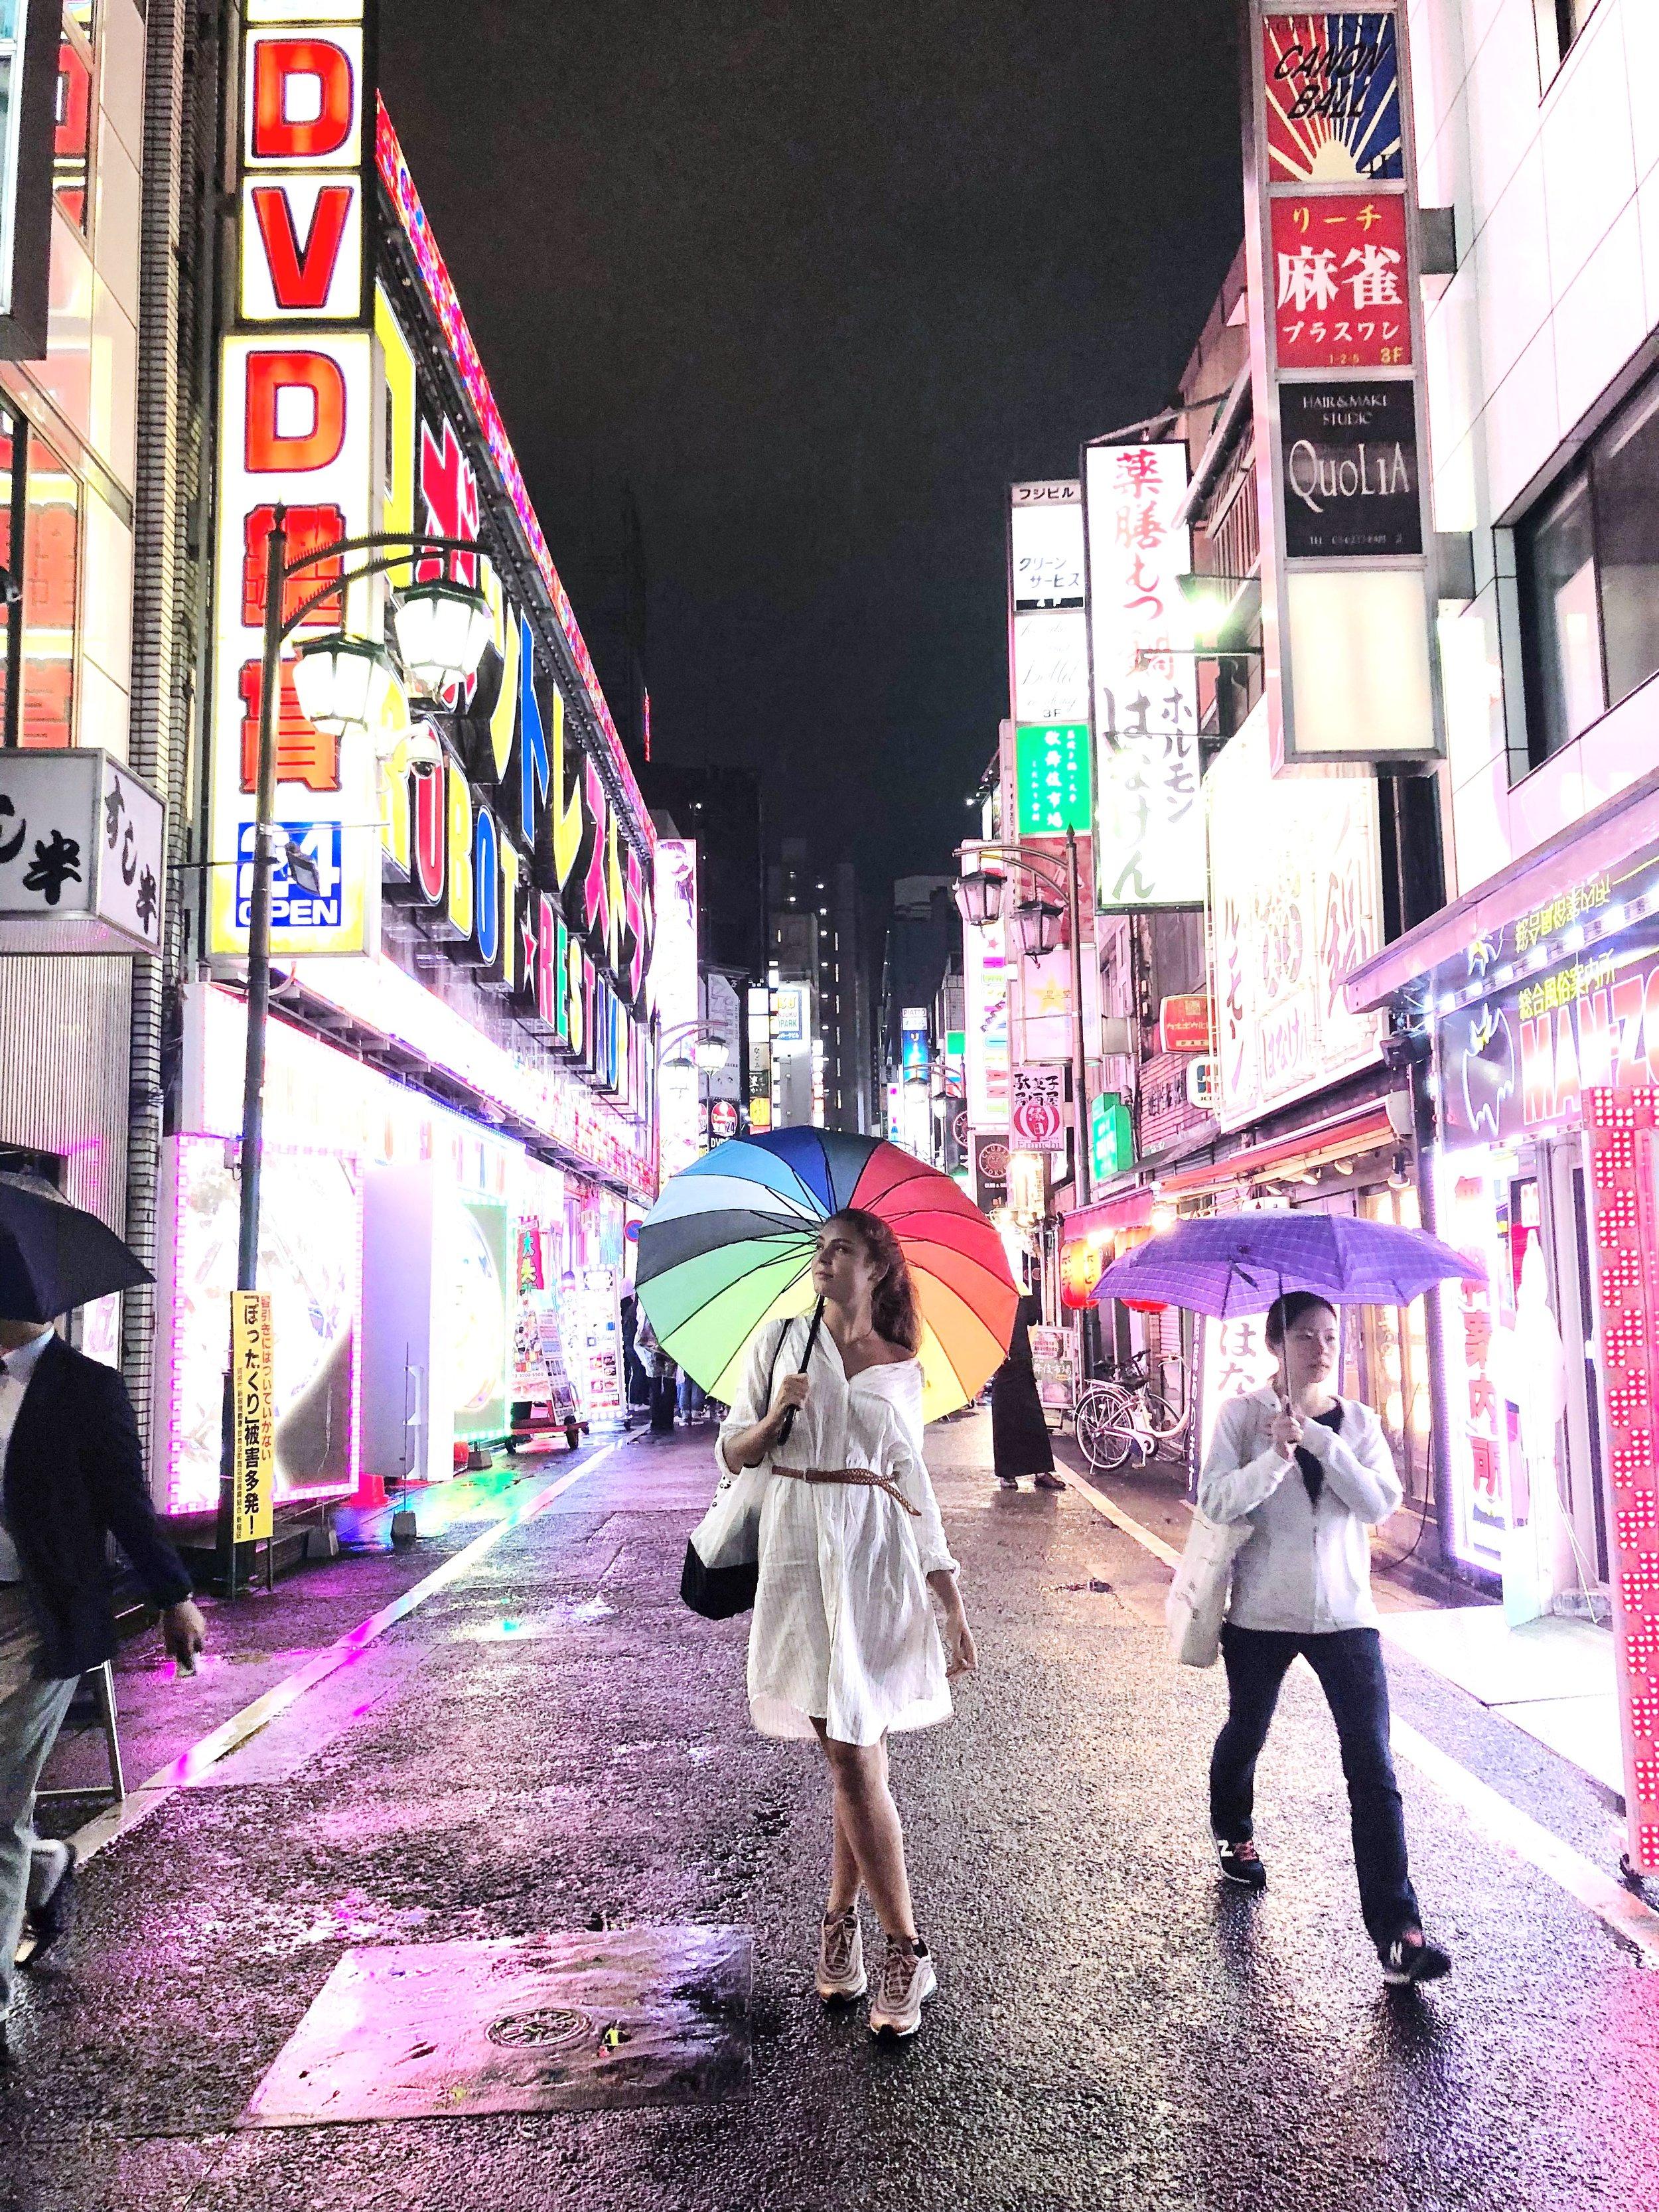 tokyo calling! - Check out Bag-alls 6 best Tokyo tips!